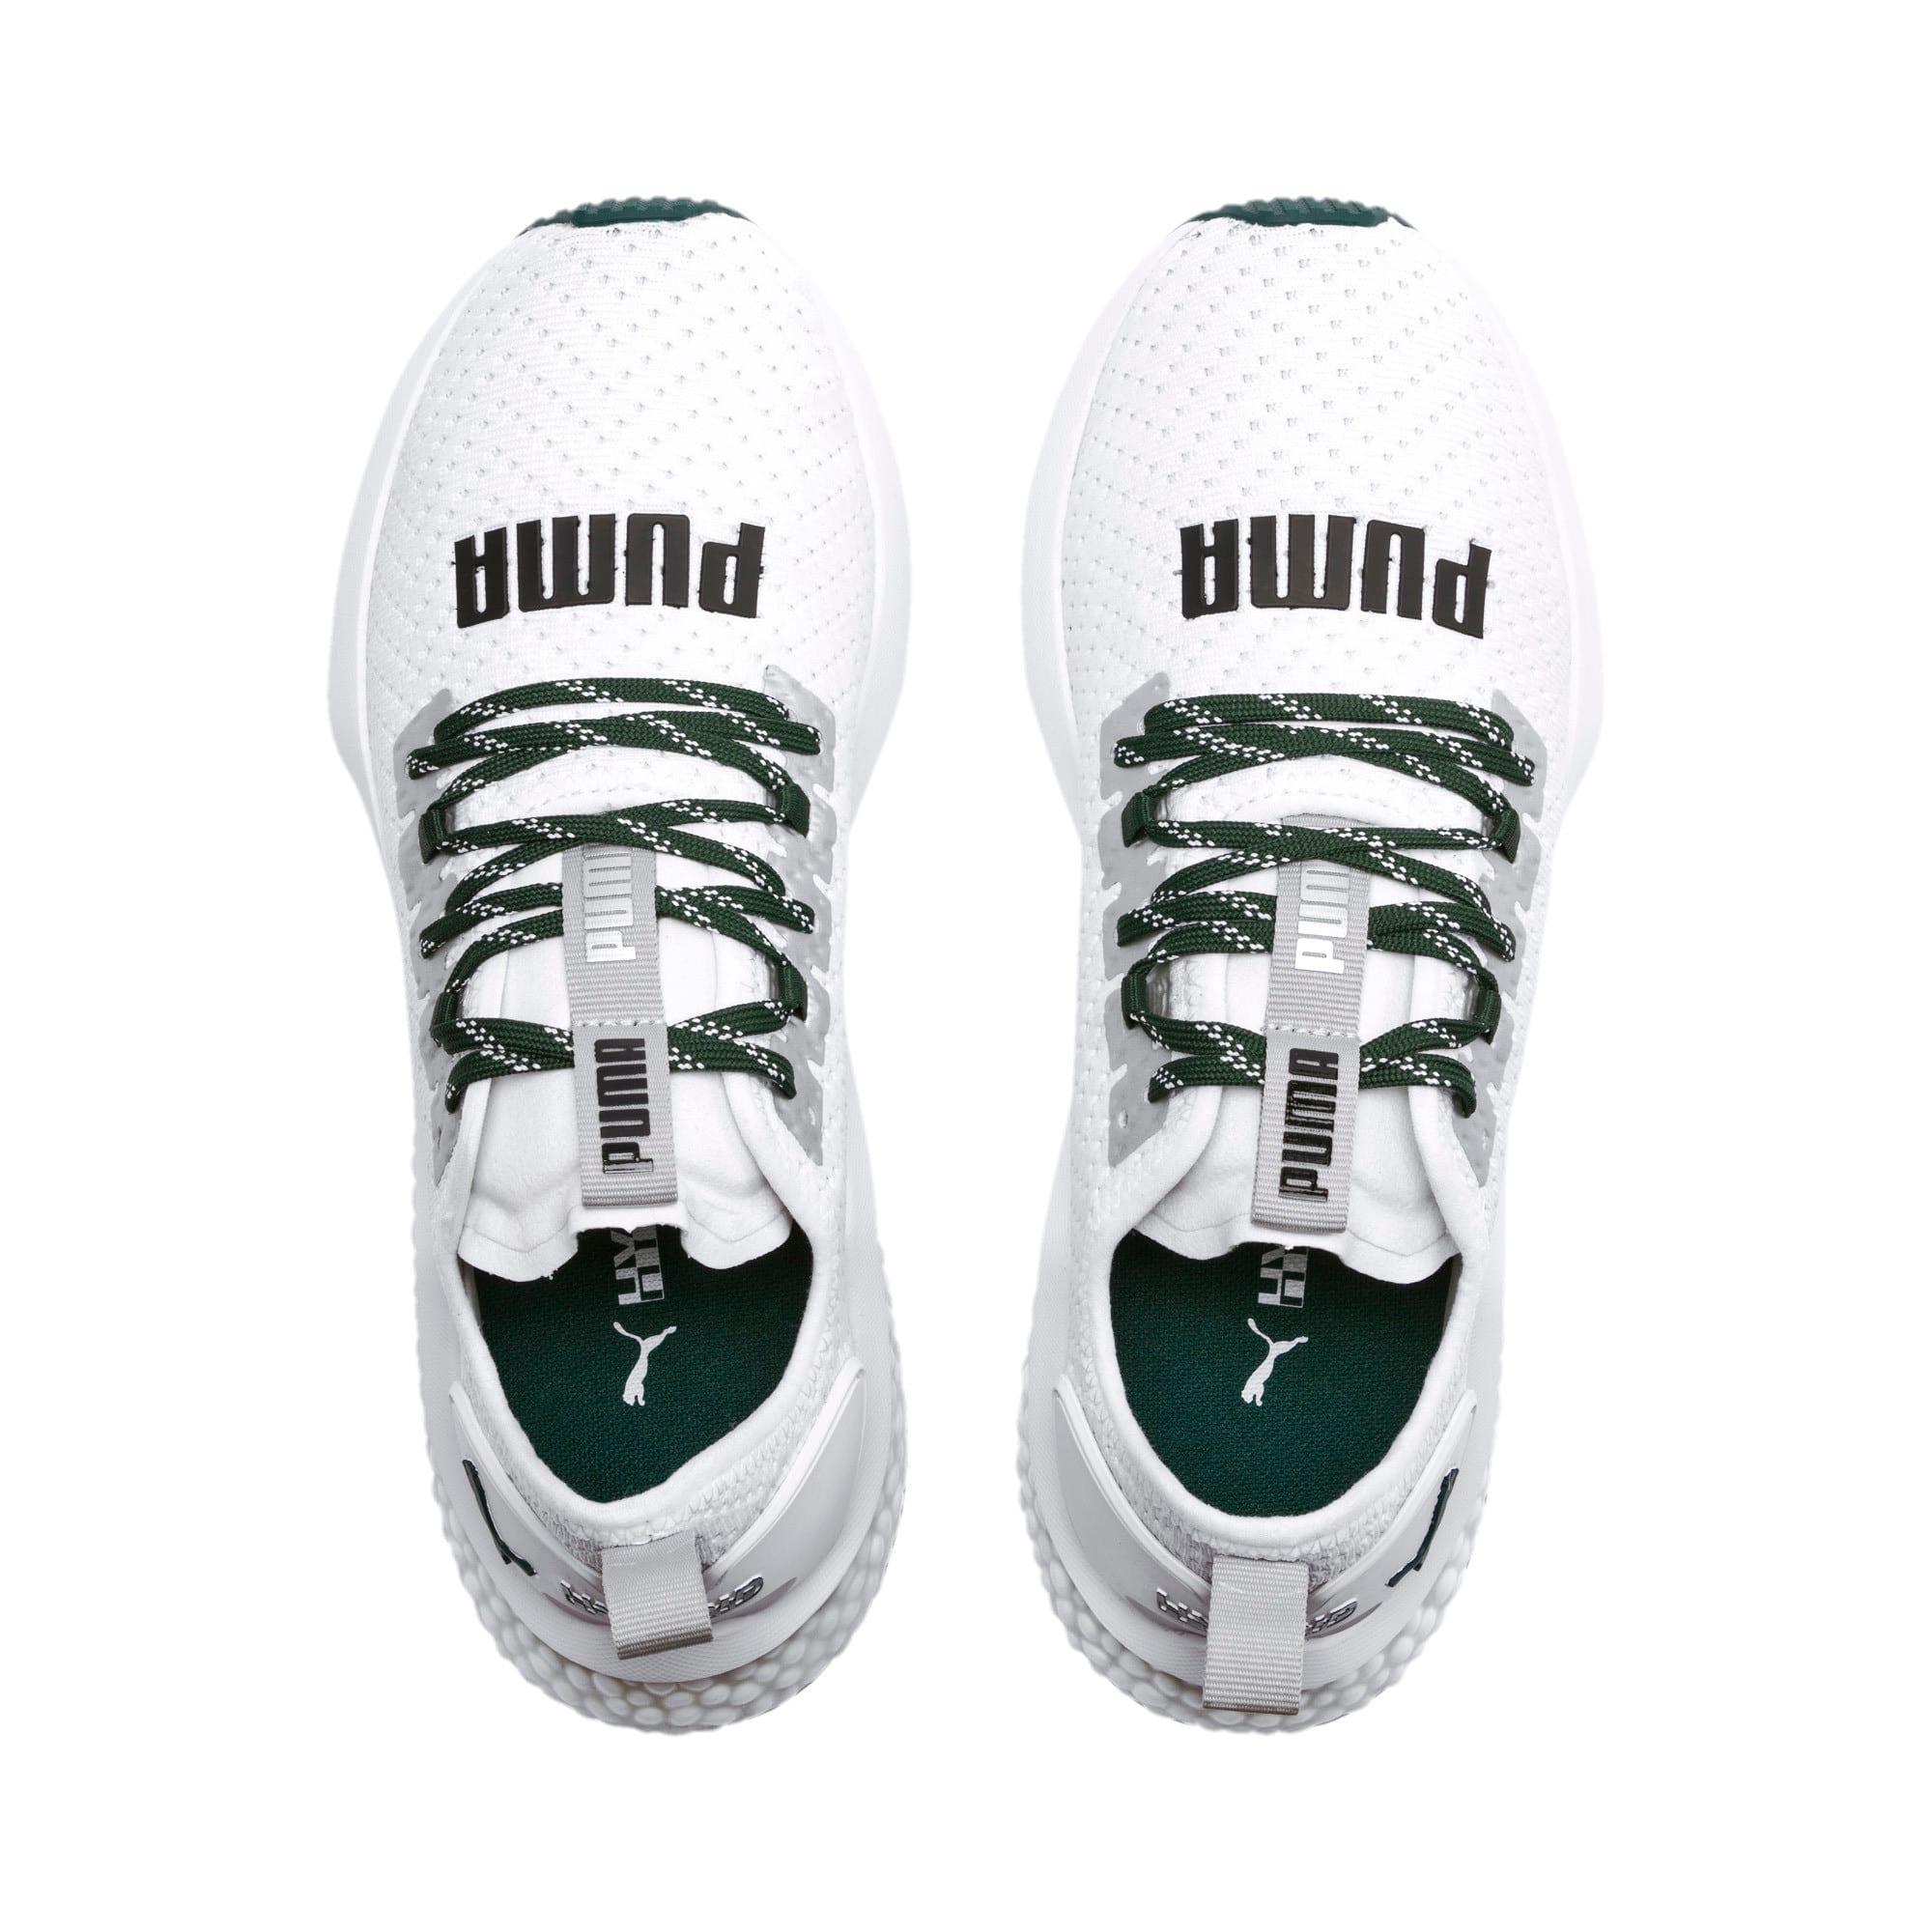 Thumbnail 7 van HYBRID NX Trailblazer hardloopschoenen voor vrouwen, Puma White-Ponderosa Pine, medium